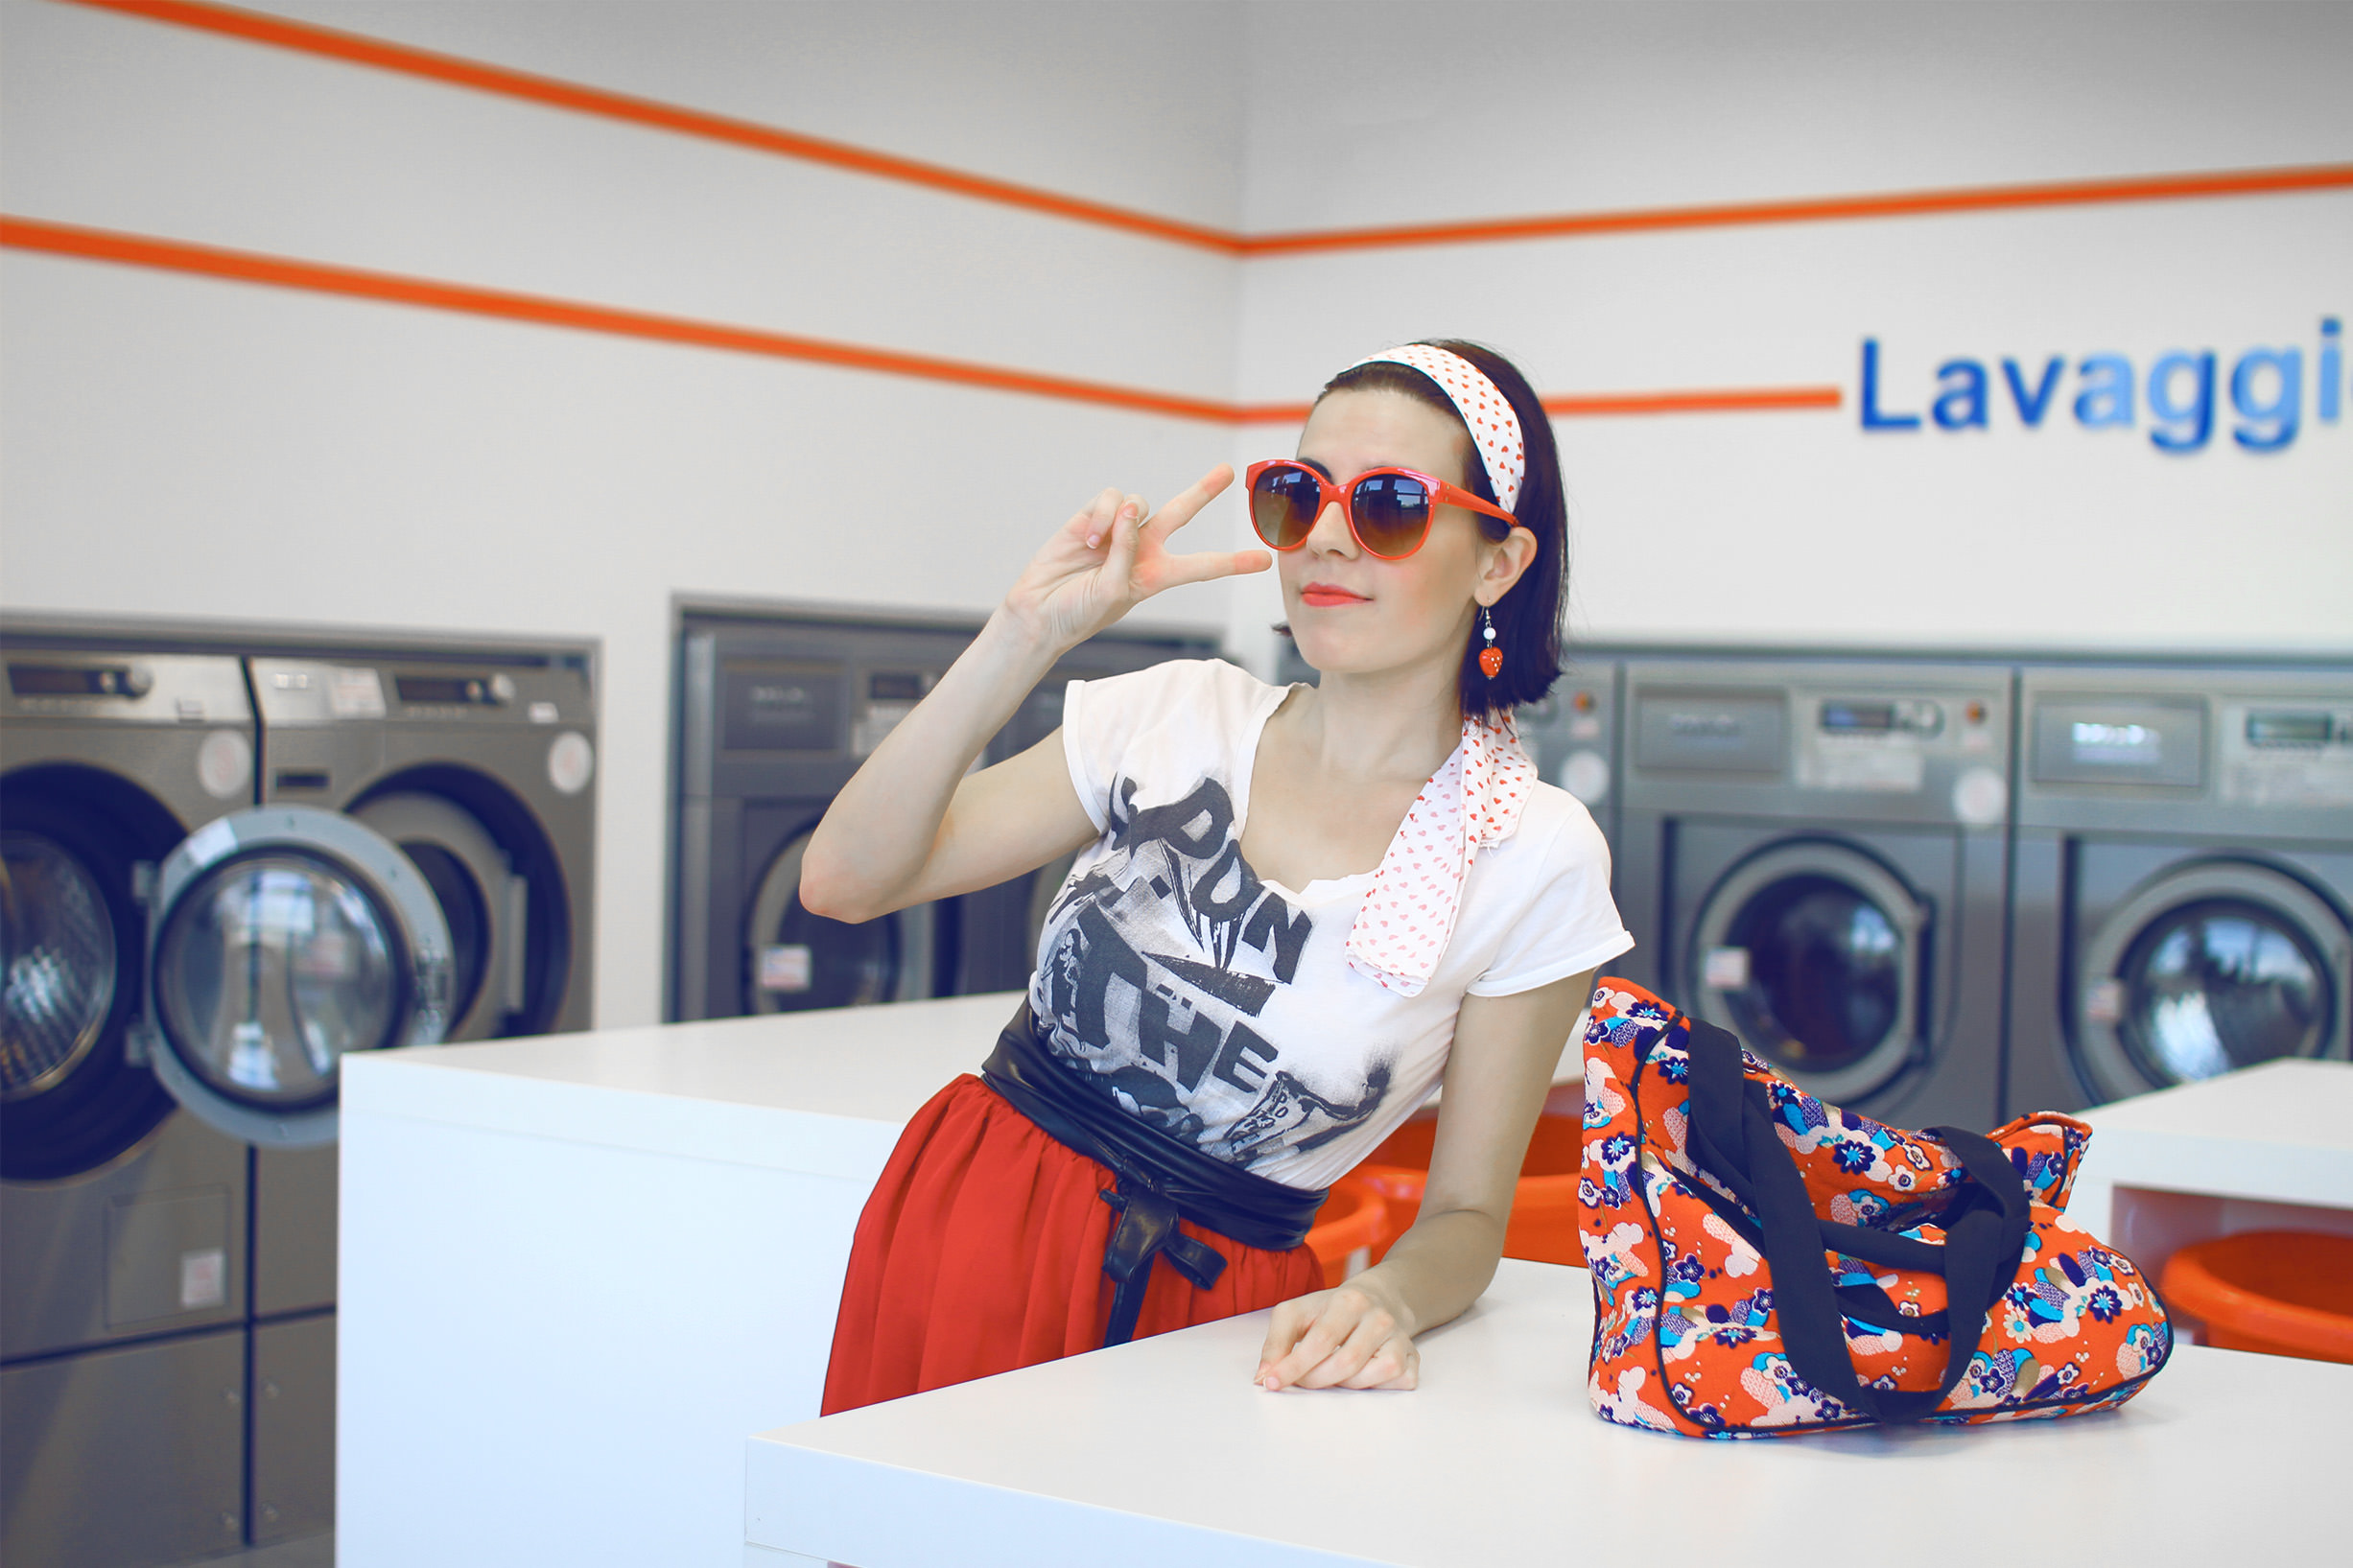 lavanderina-077-ok